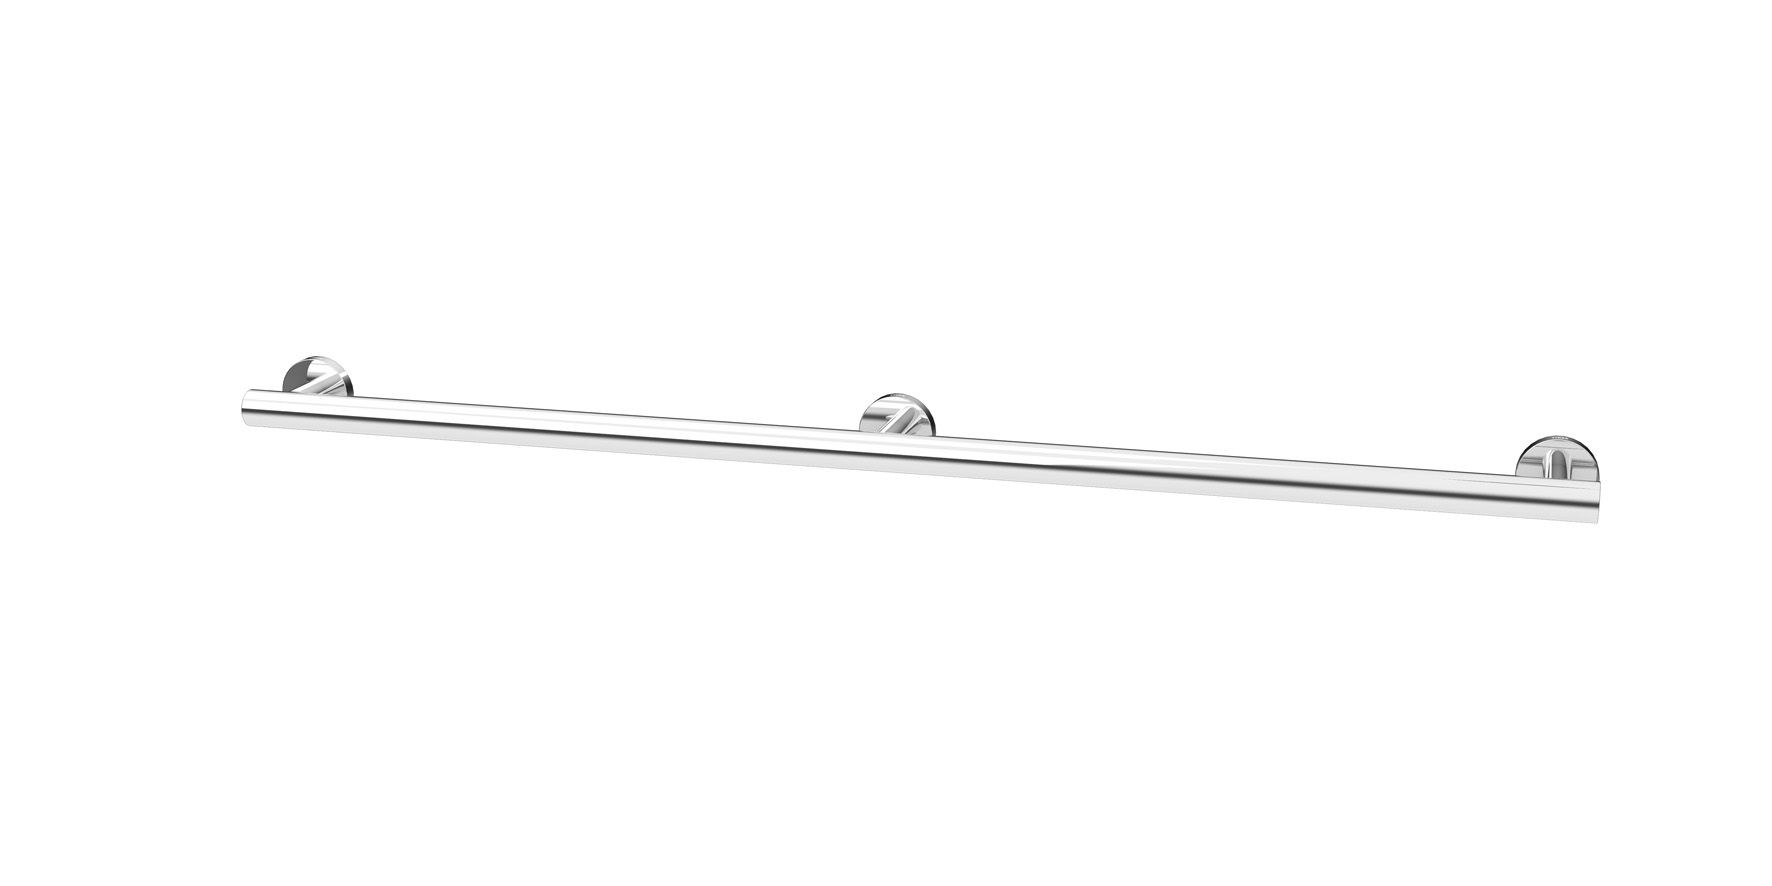 Tiger Boston Comfort & Safety veiligheidsgreep 90 cm RVS glans